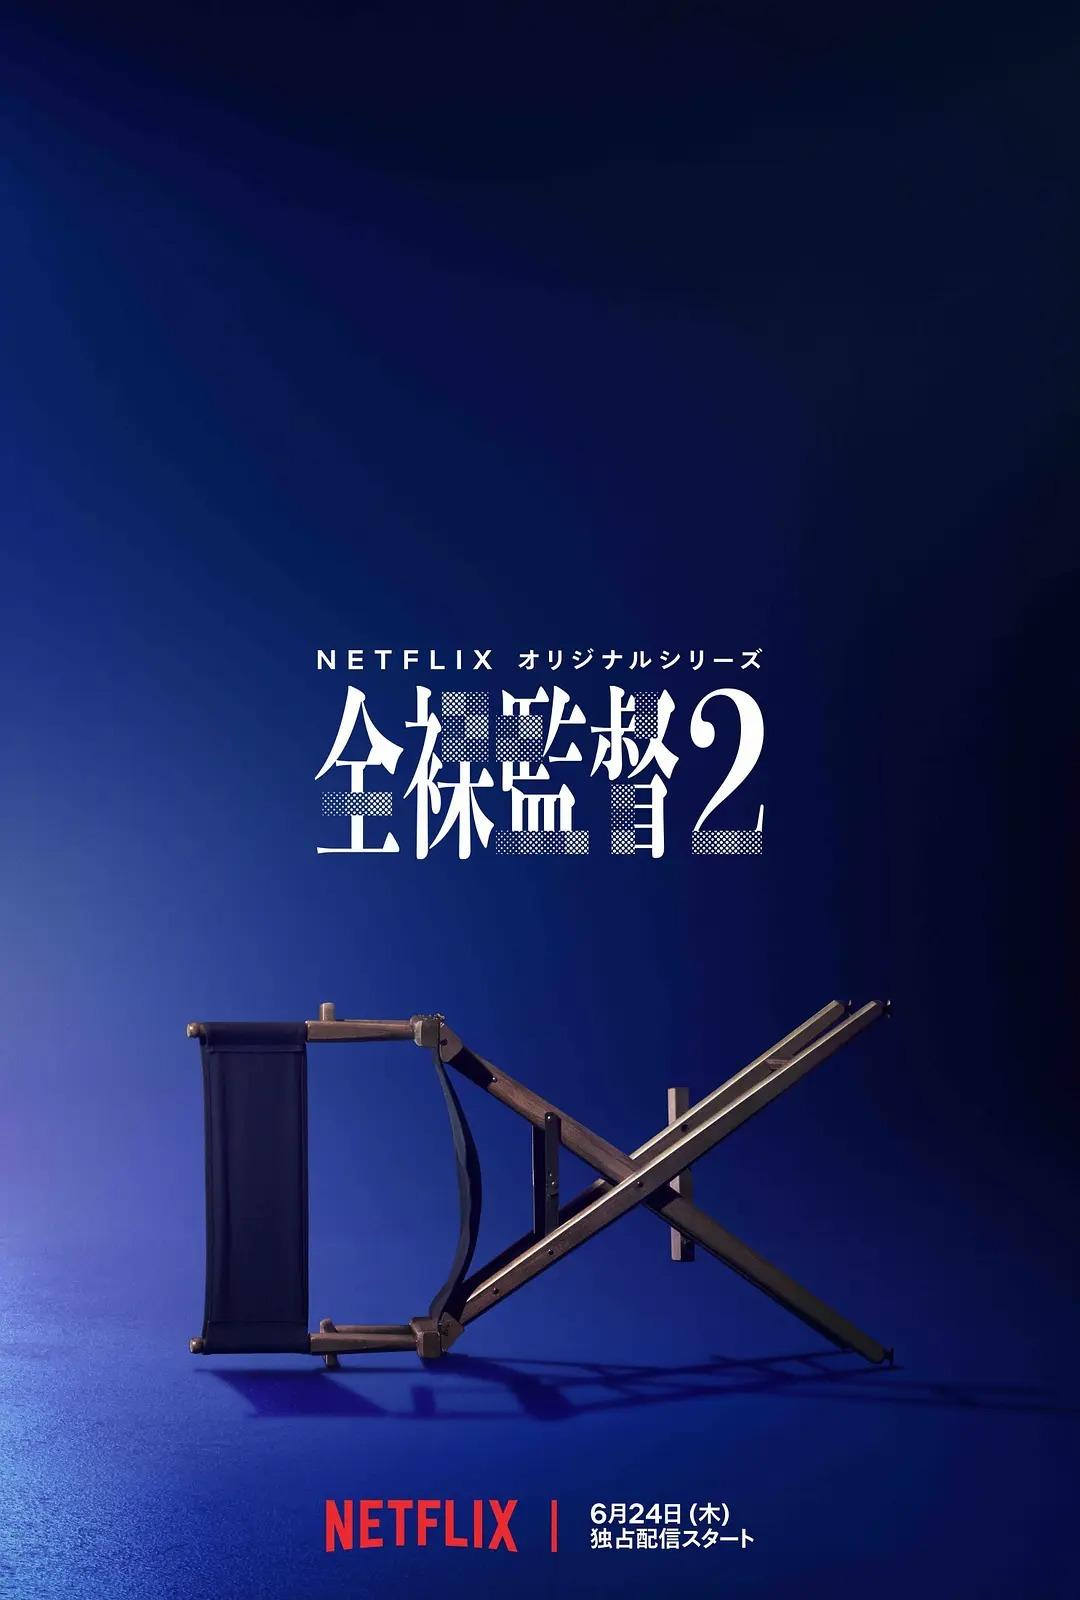 全裸导演 第二季 全裸監督 シーズン2.jpg